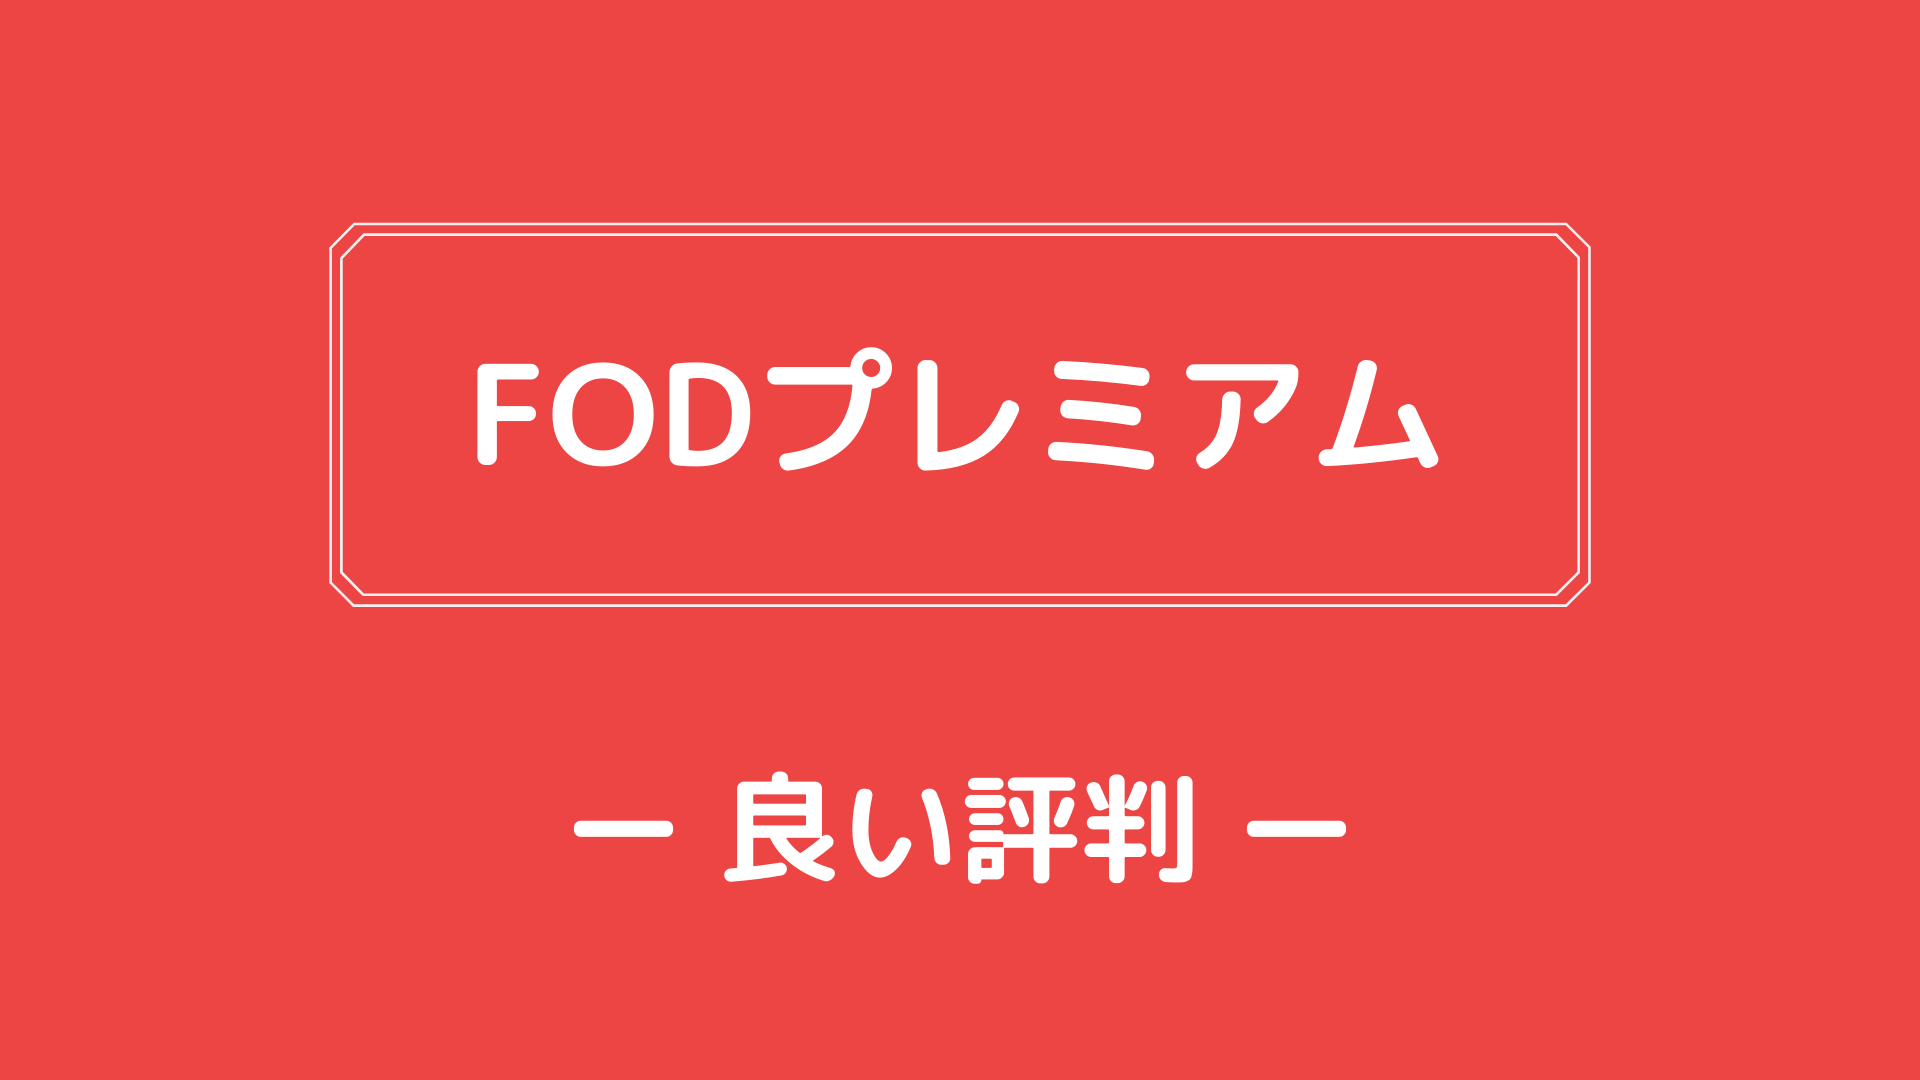 FODプレミアムの良い評判・口コミ